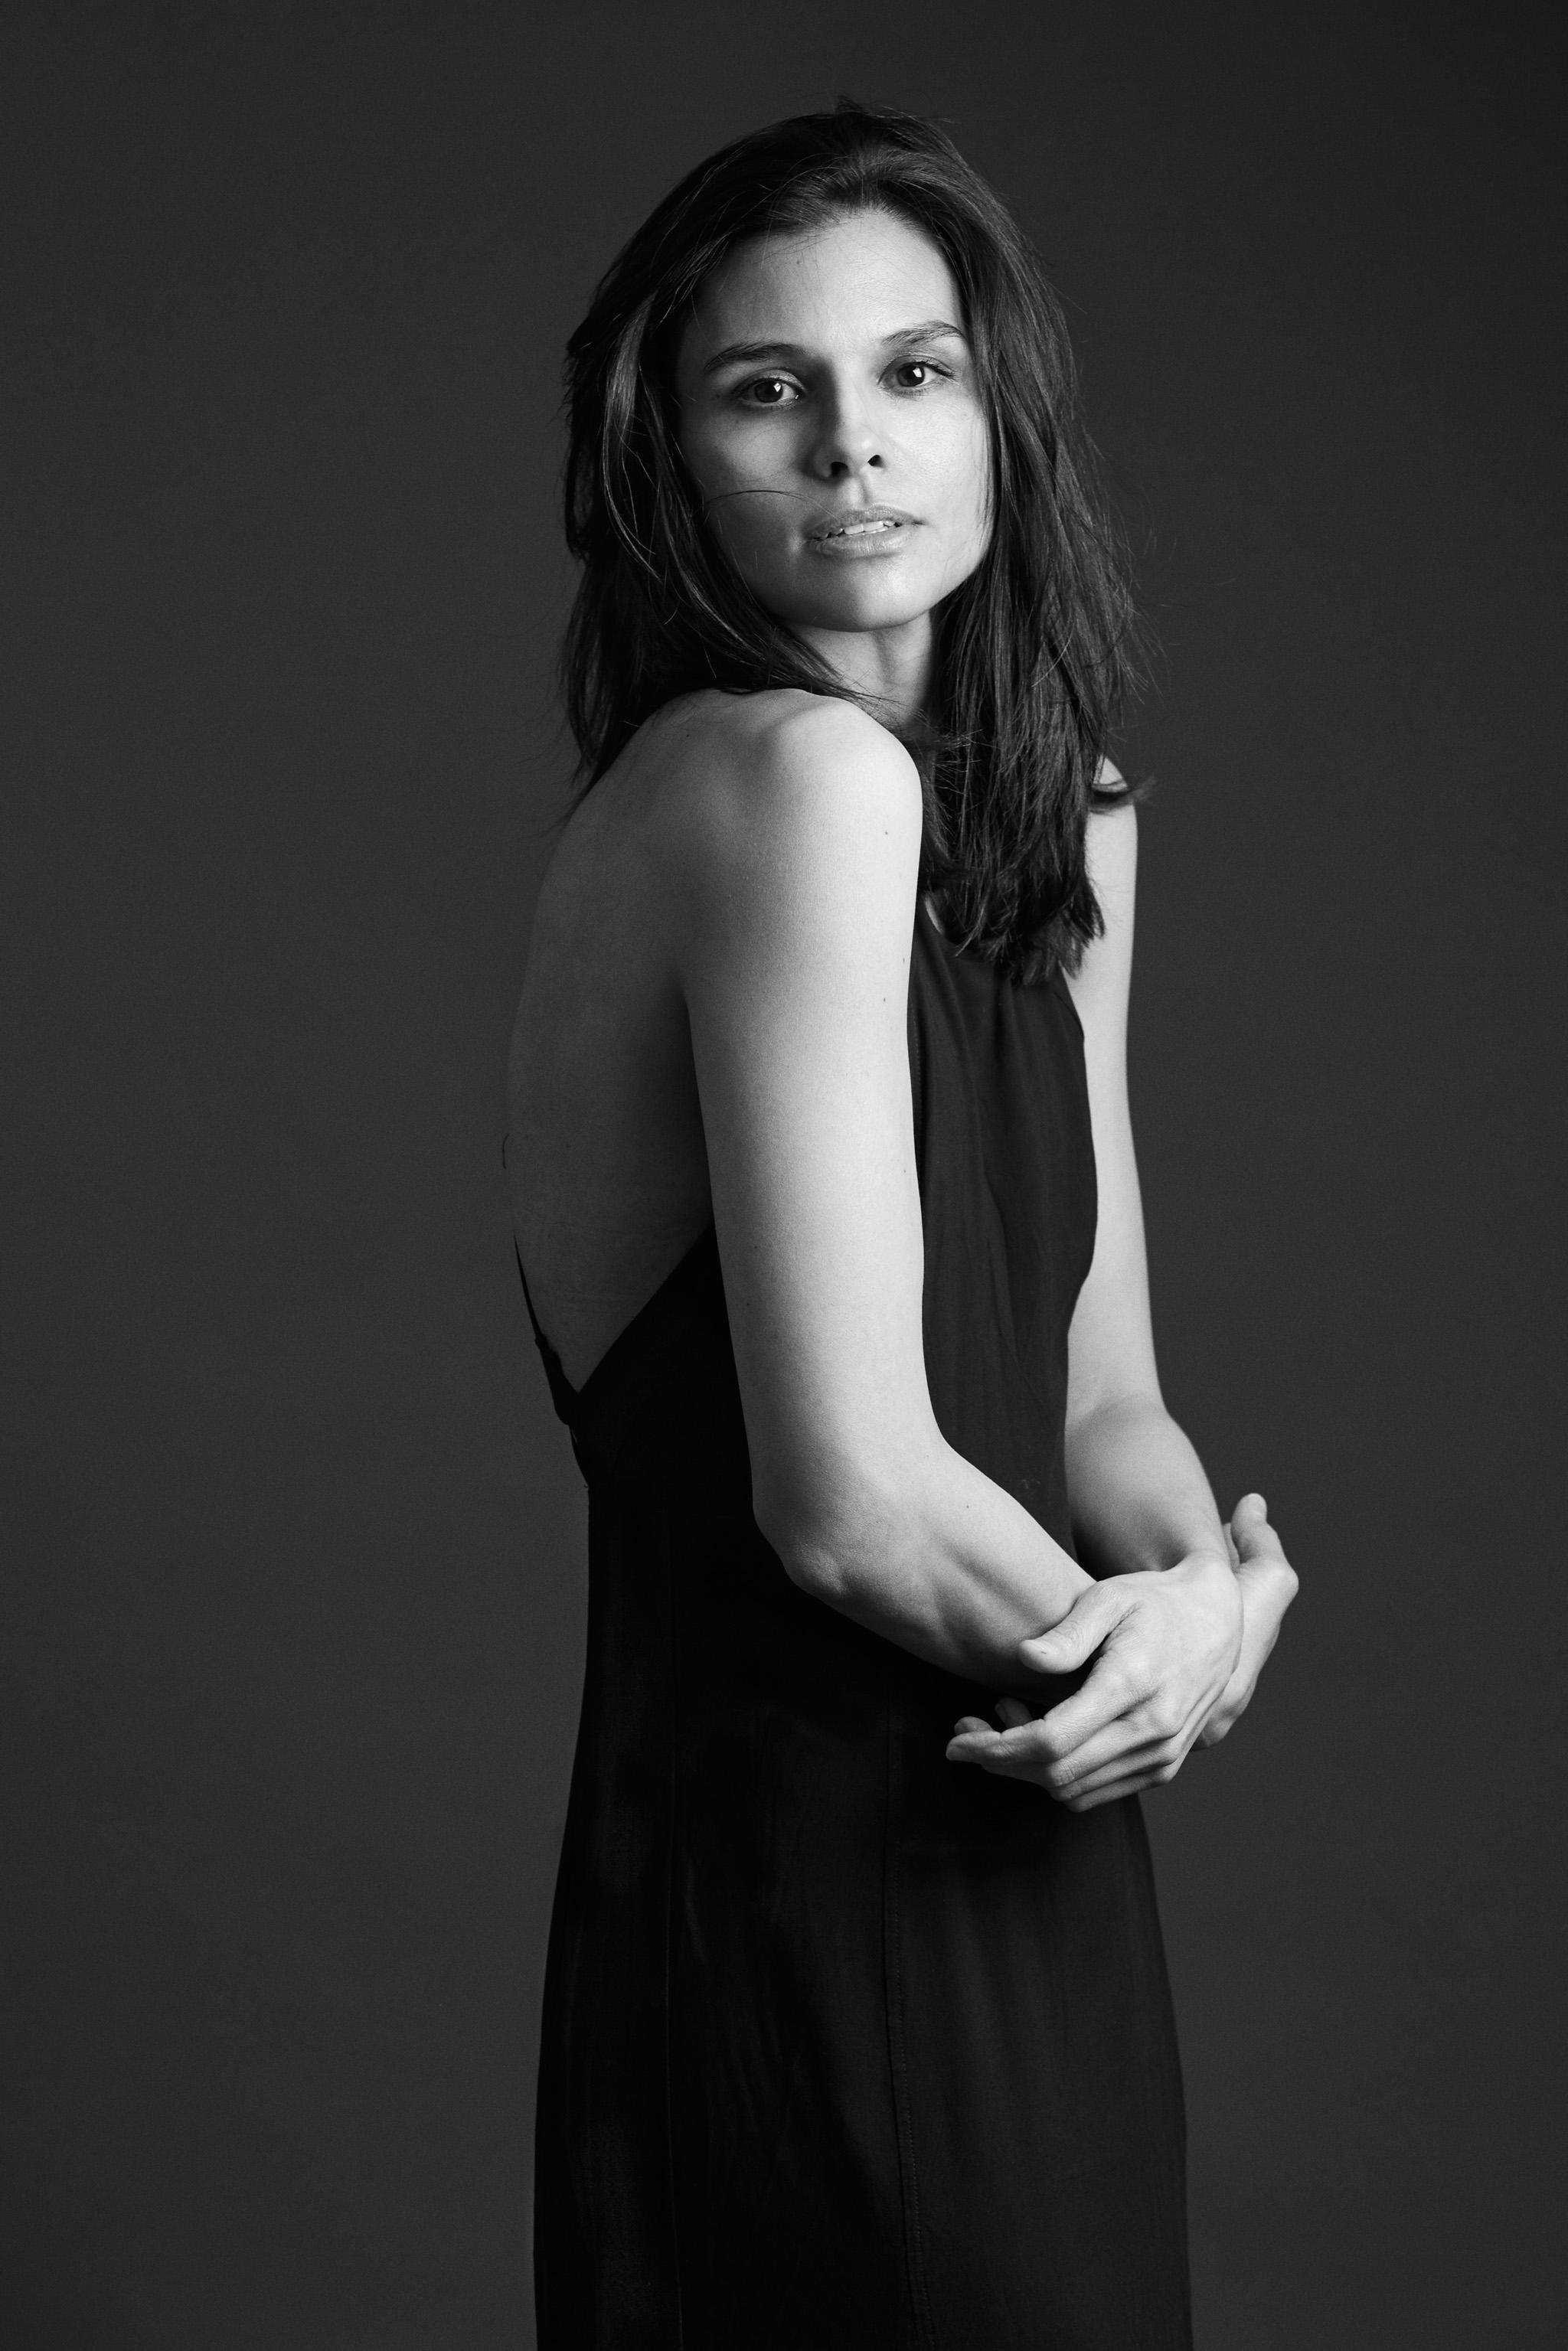 Nicole_Peelman_Portrait_Commercial_Model_Fashion_Shoot_Minneapolis_Photographer_Joe_Lemke_001.JPG